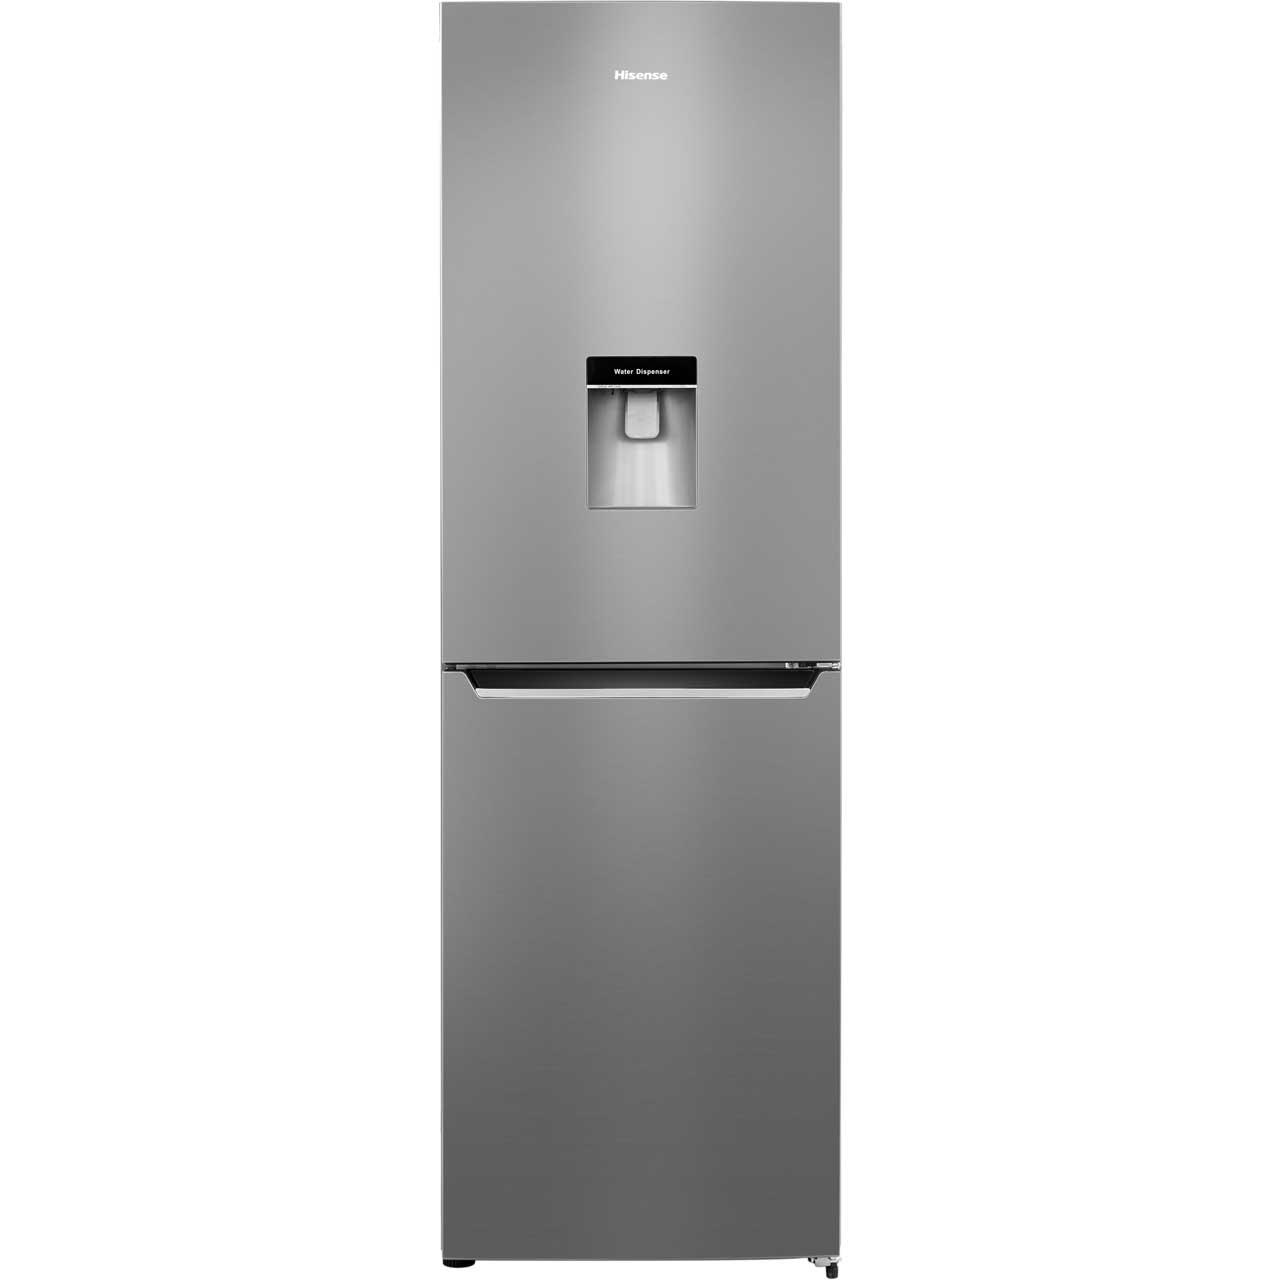 Hisense Rb381n4wc1 Fridge Freezer Appliance Spotter